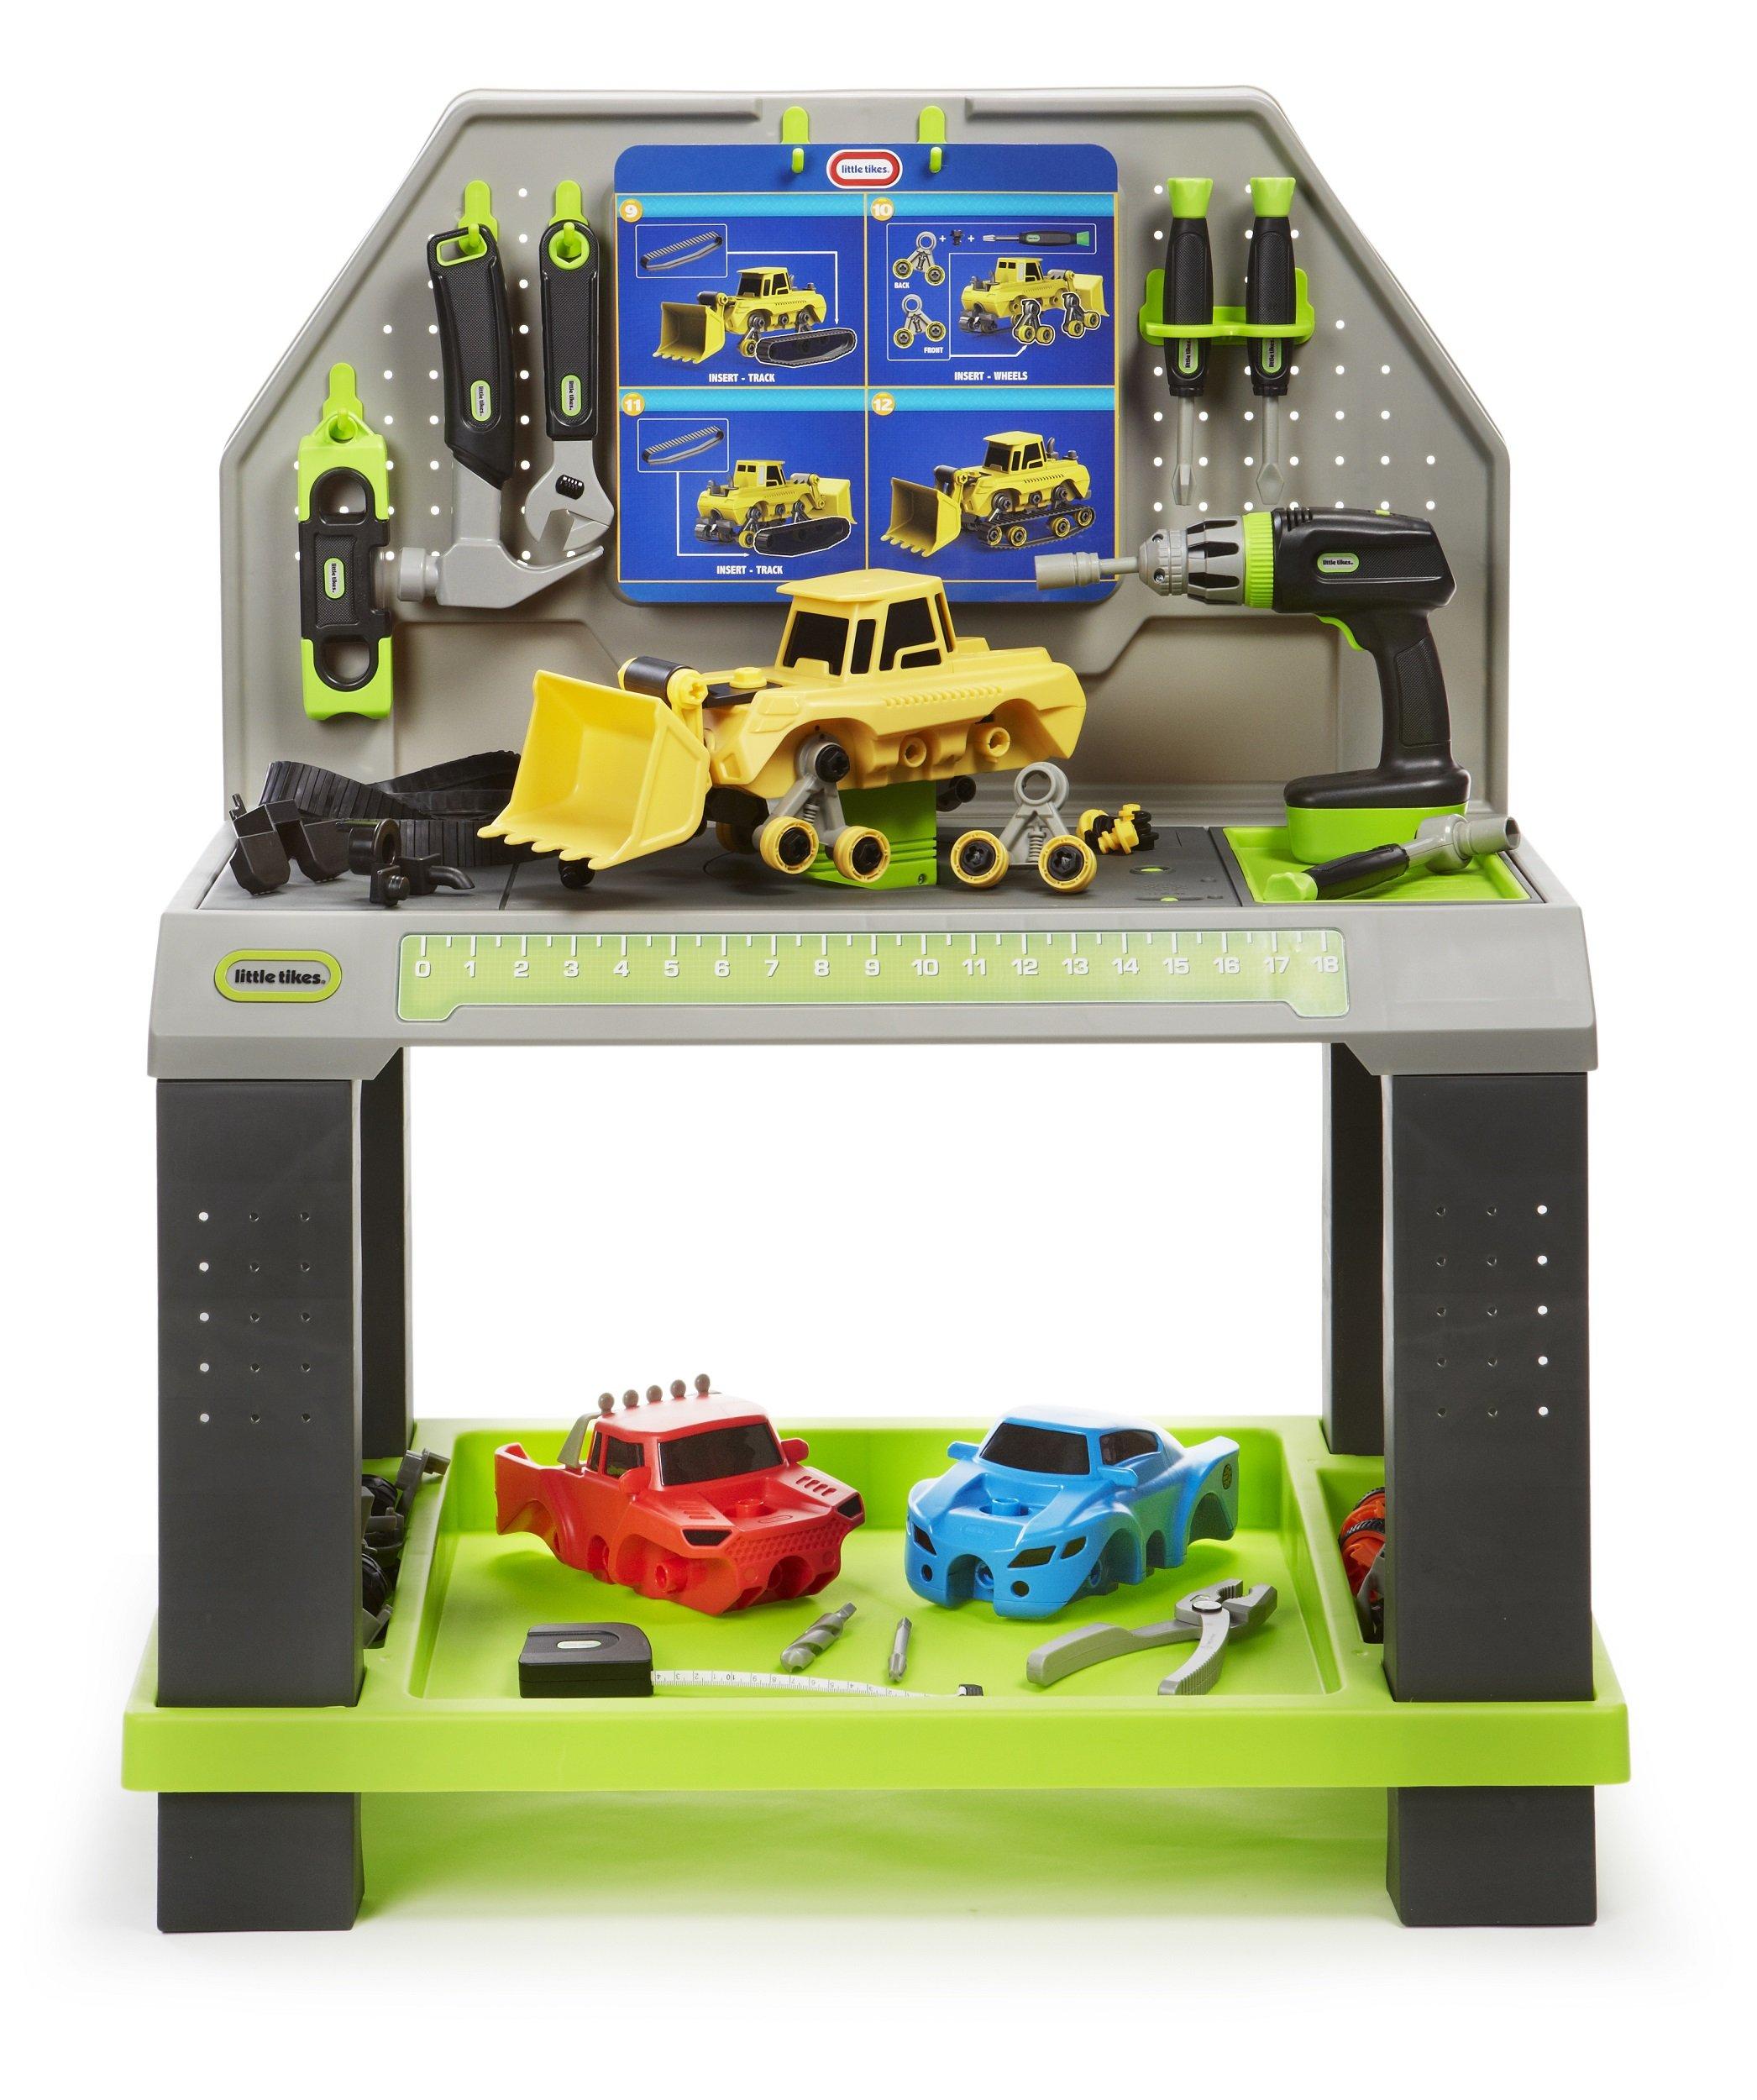 Little Tikes Construct 'n Learn Smart Workbench